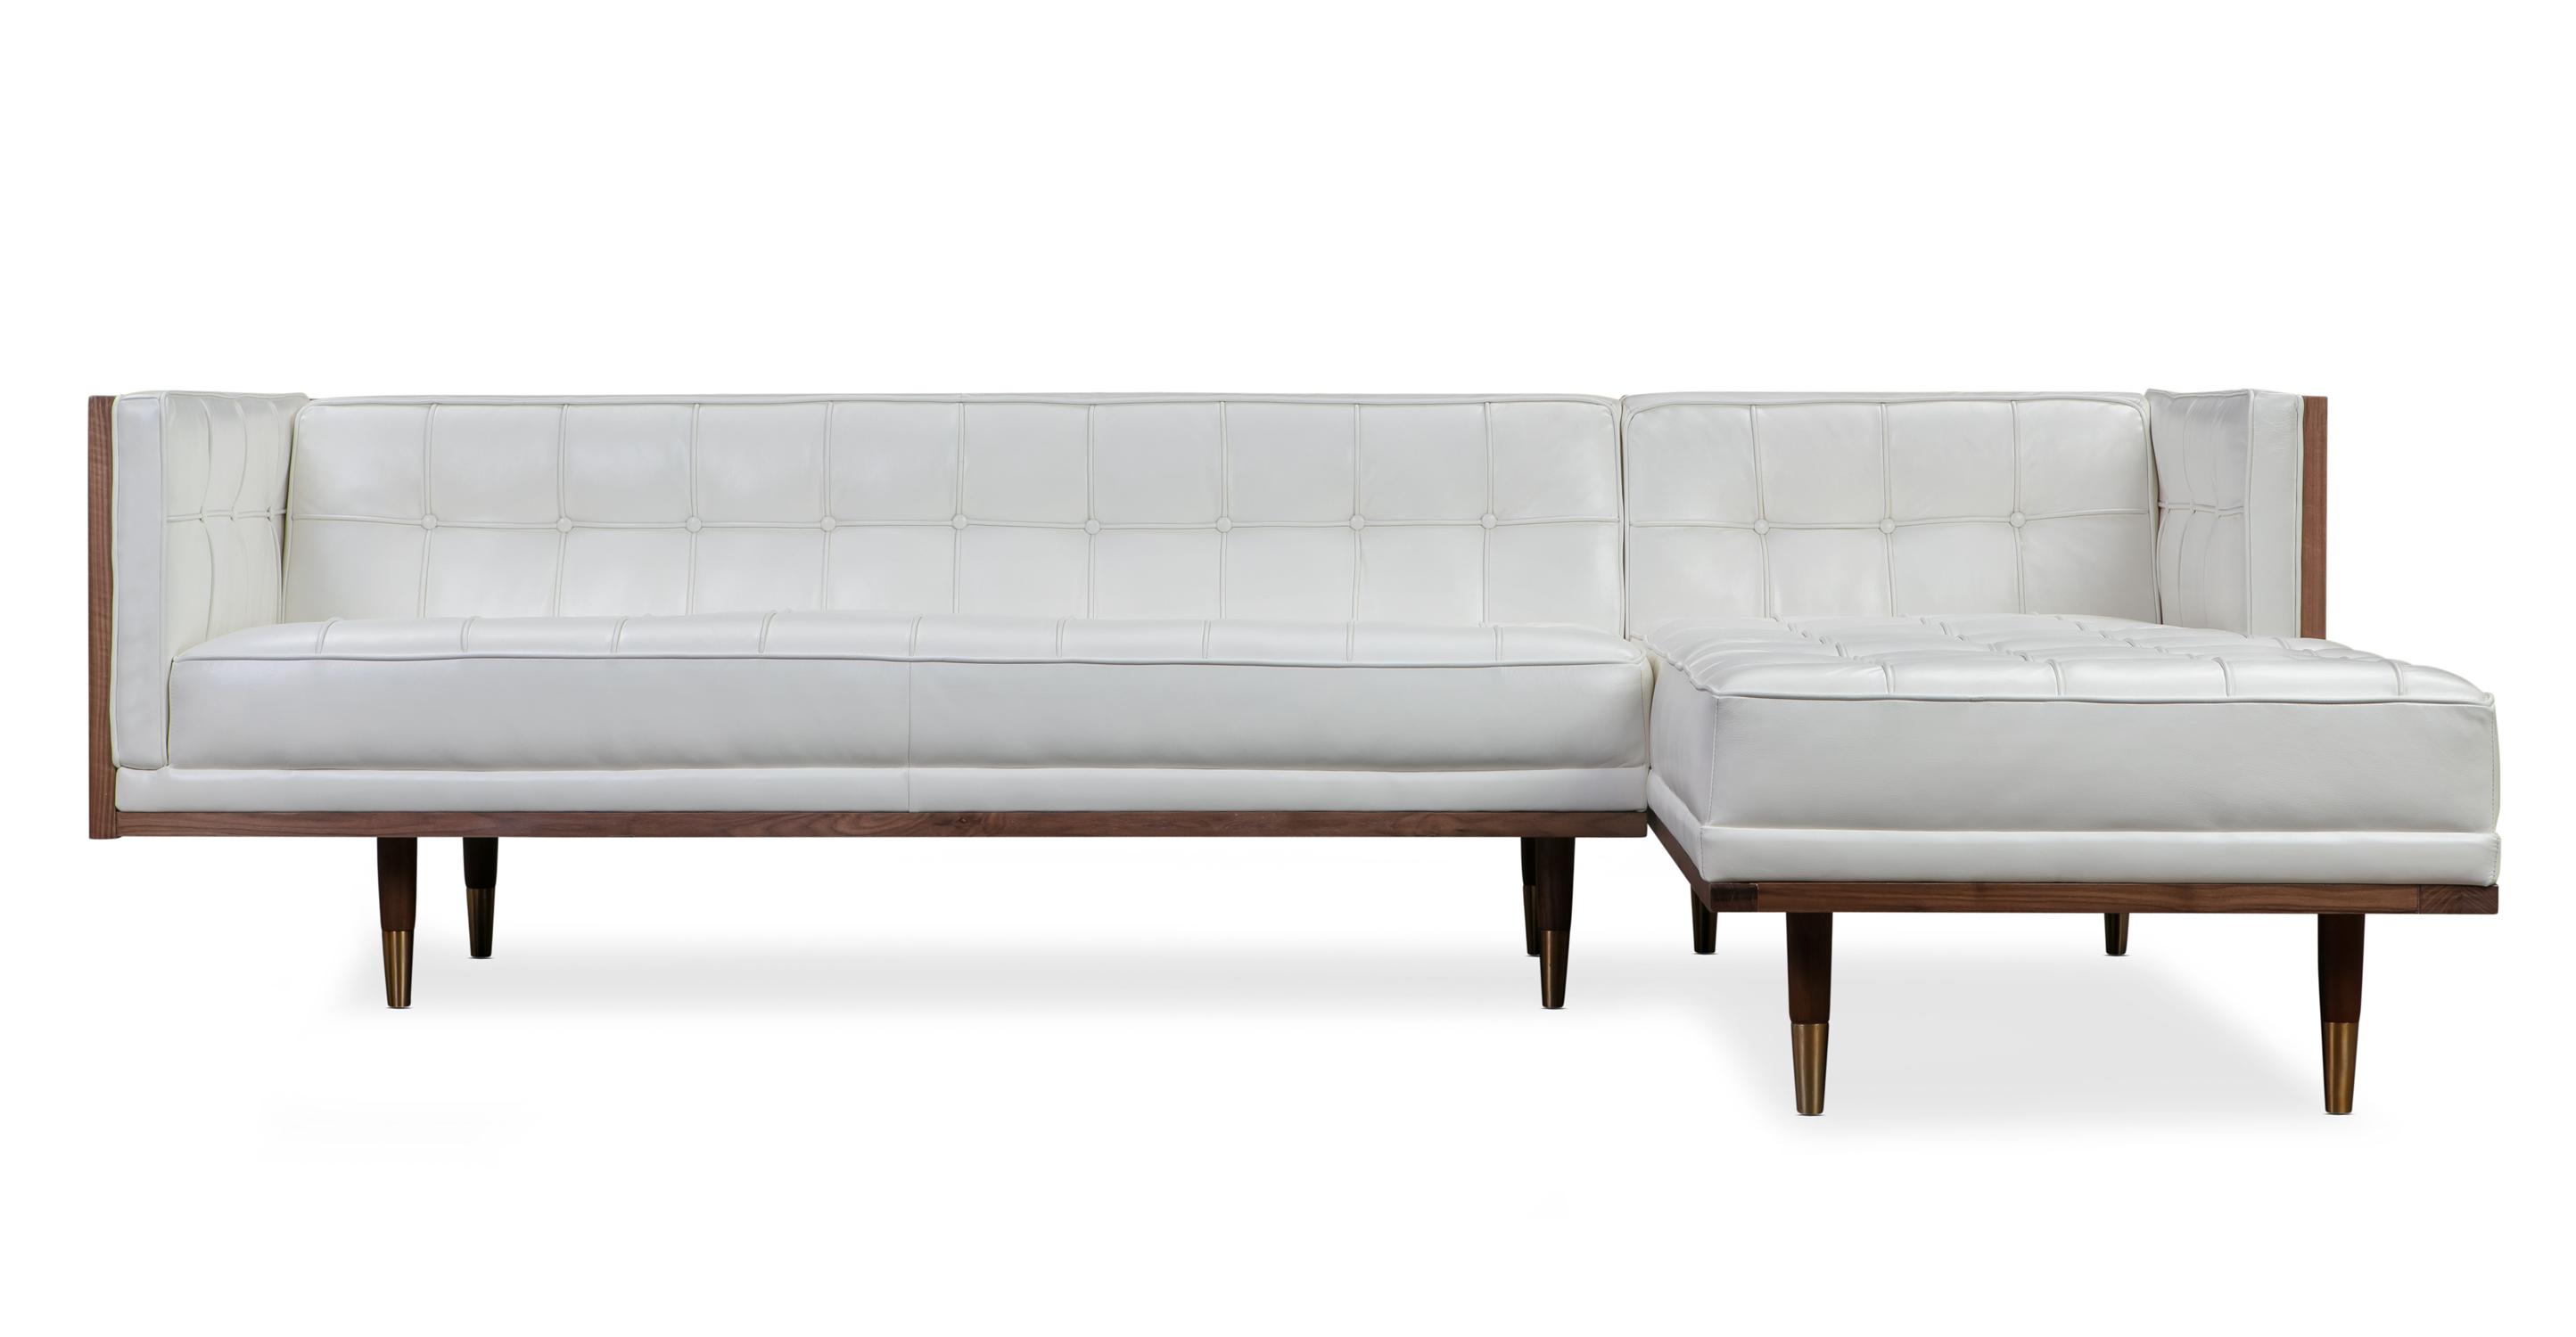 "Woodrow Box 100"" Leather Sofa Sectional Right, Walnut/White Aniline"